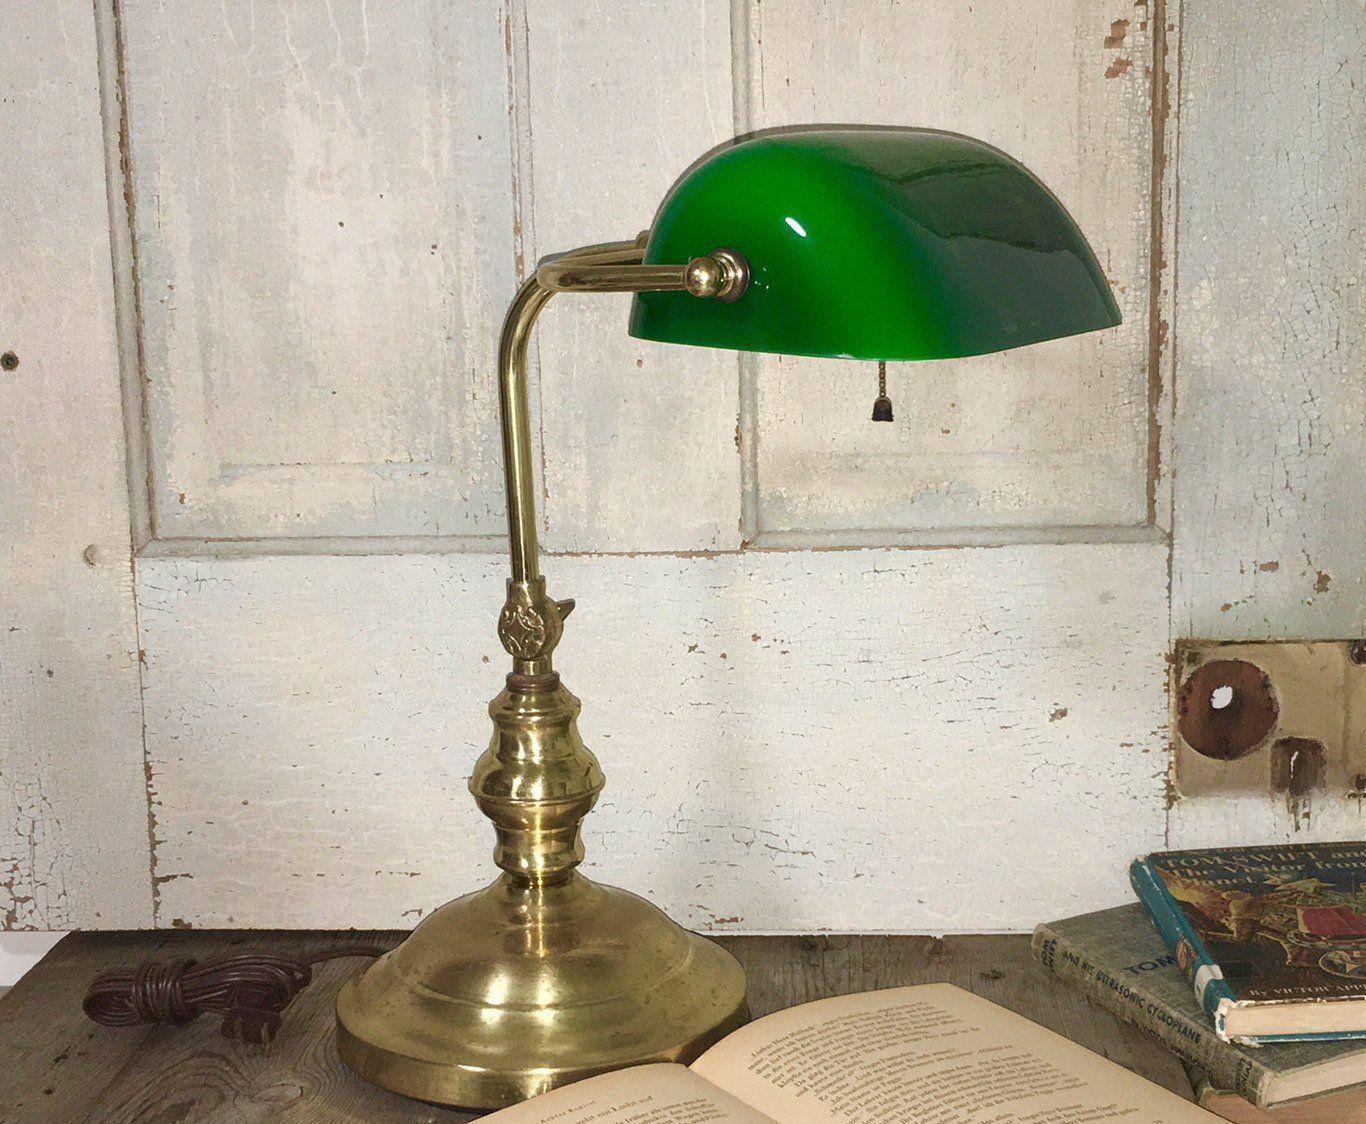 Vintage Green Shade Bankers Desk Lamp With Adjustable Ornate Desk Lamp Lamp Table Lamp Lighting